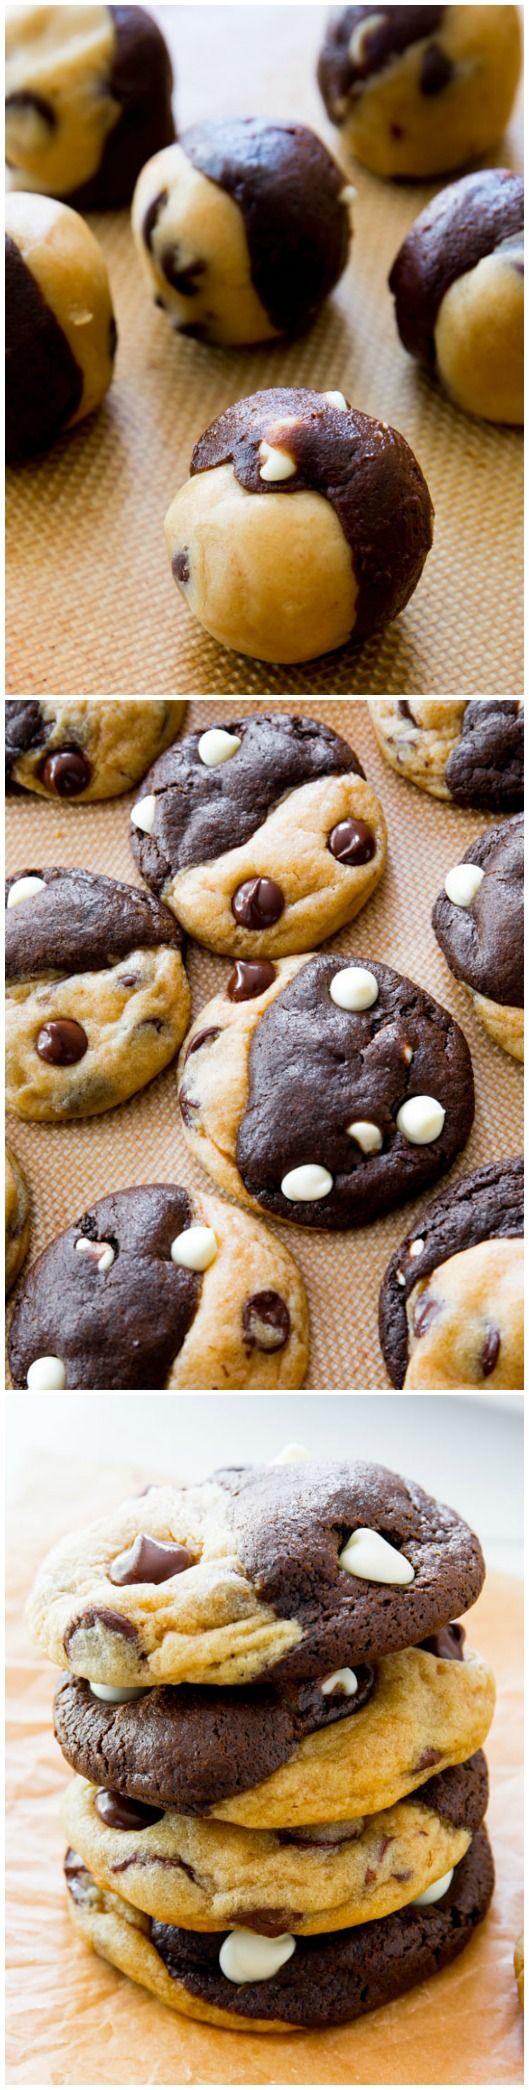 Double chocolate chip swirl cookies